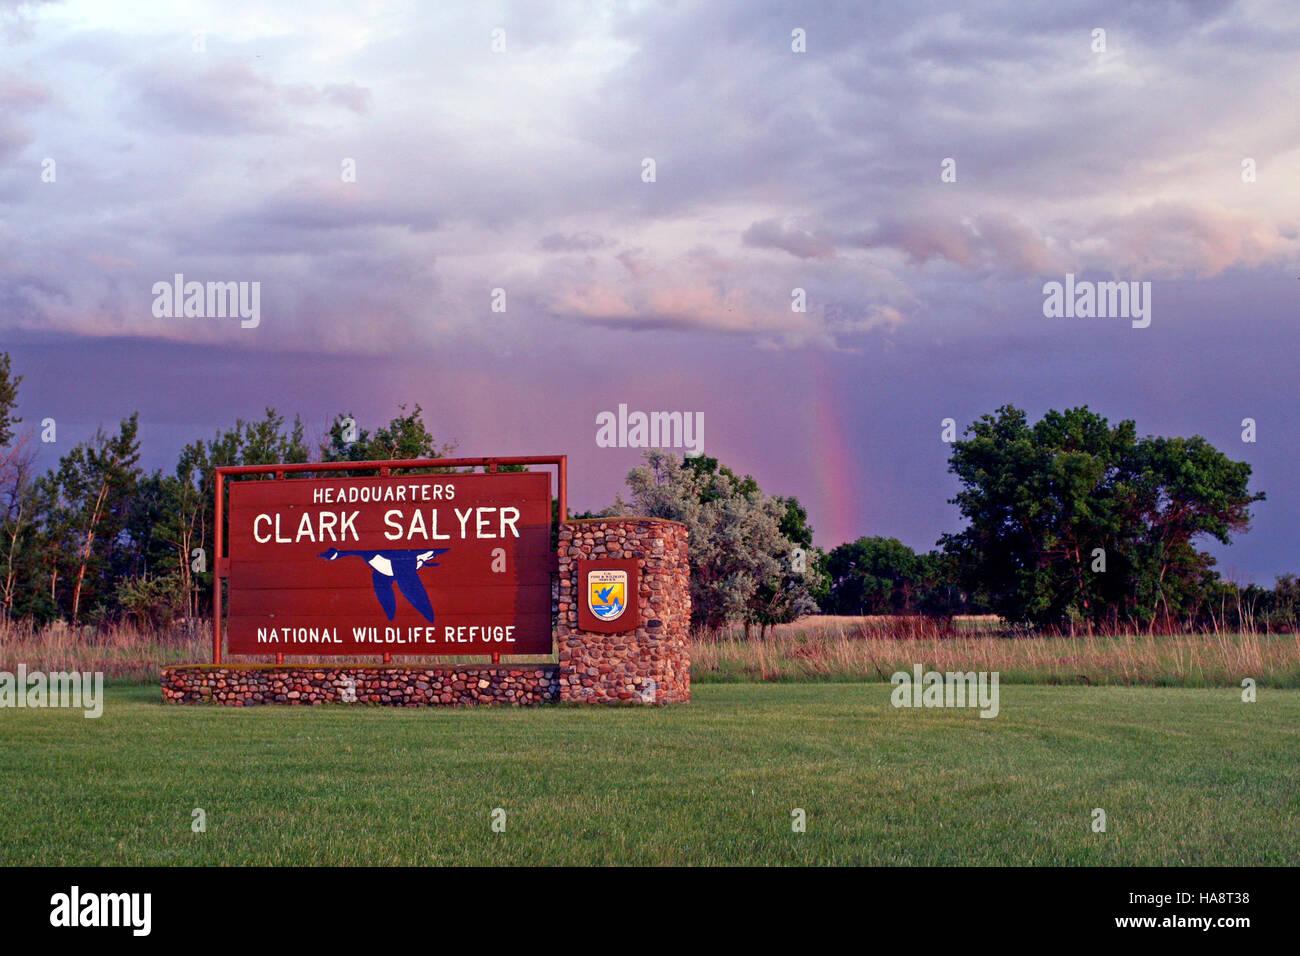 usfwsmtnprairie 14727893075 A Beautiful Welcome to J. Clark Salyer NWR - Stock Image